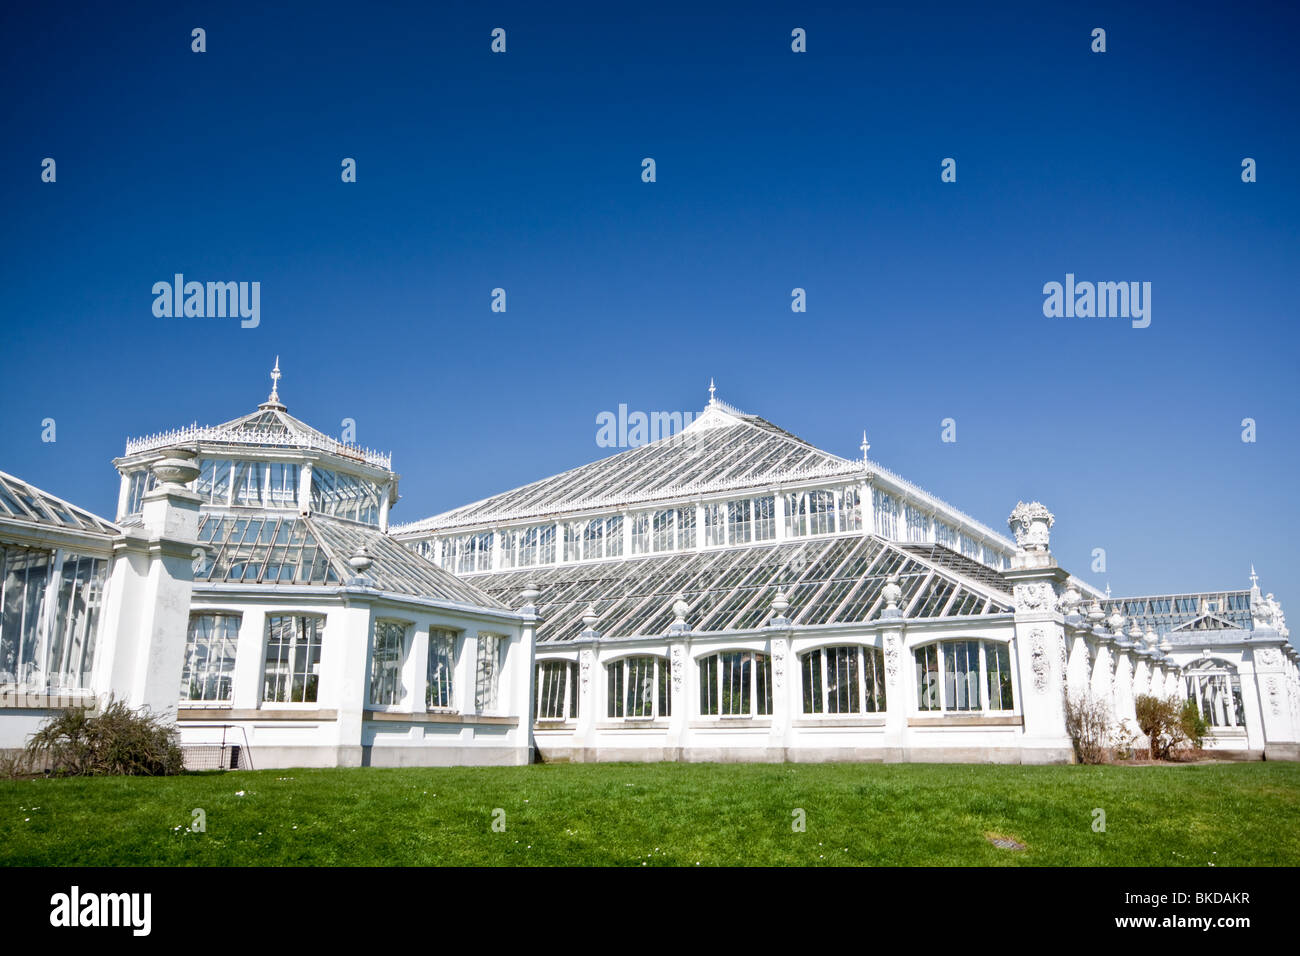 Temperate House Kew Gardens - Stock Image